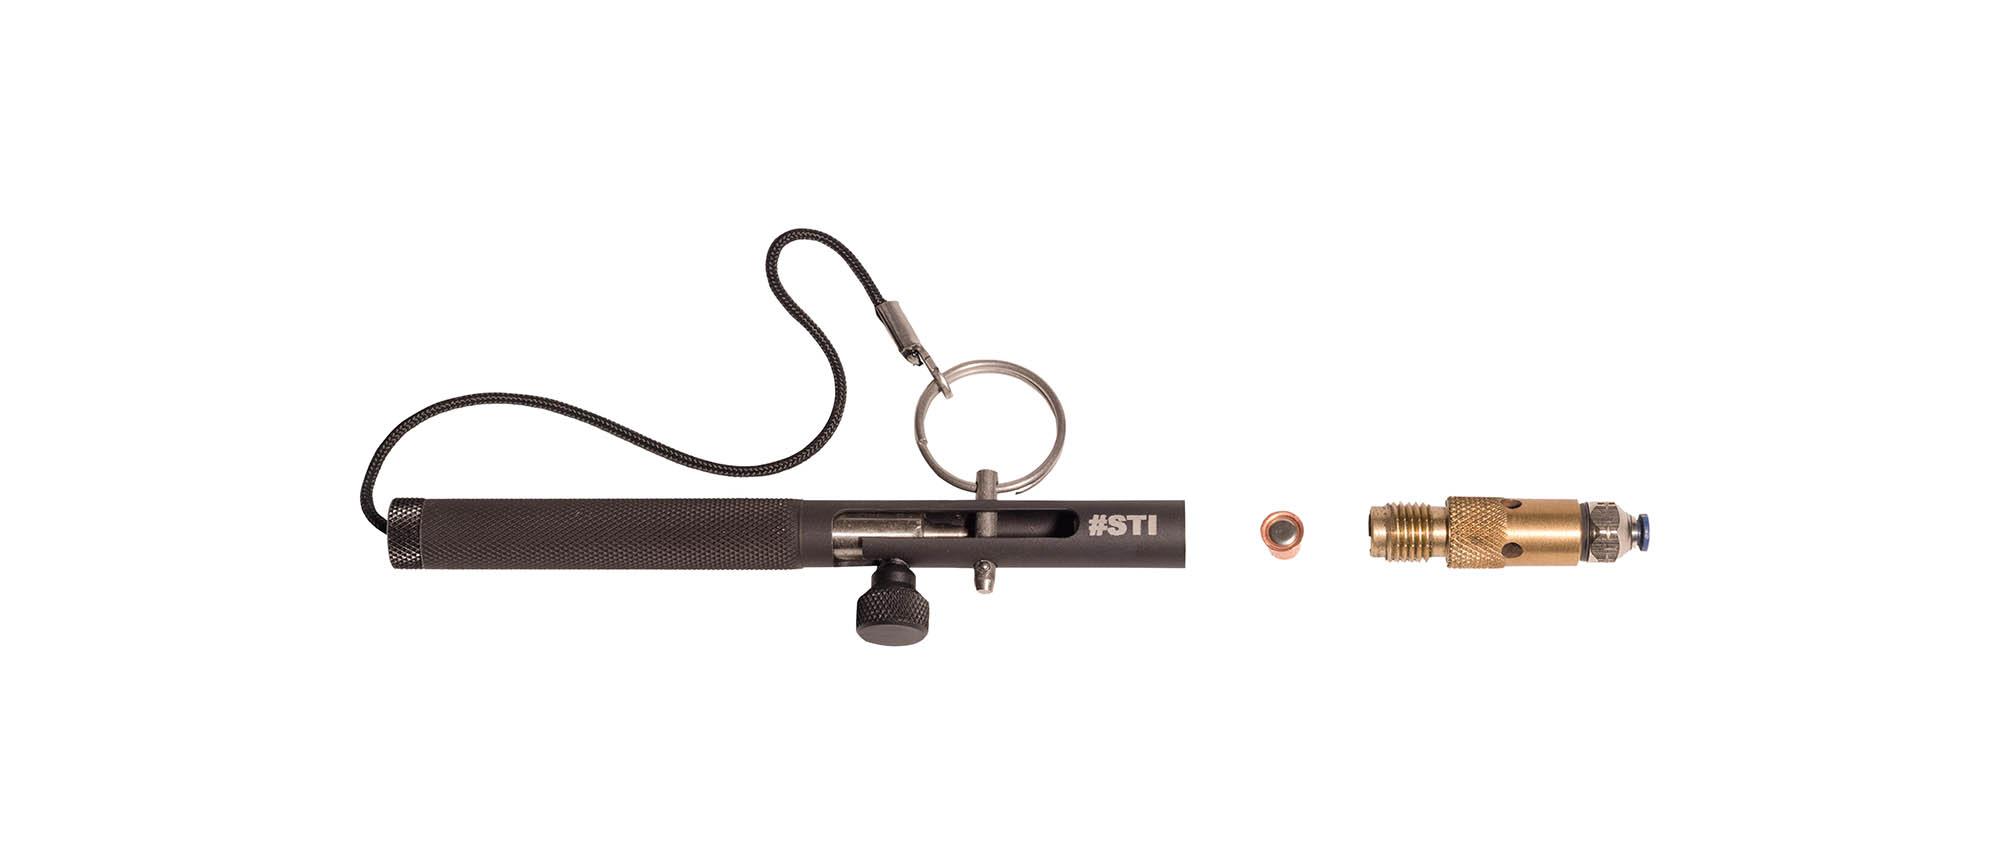 Sti Shock Tube Igniter Single Pen Nav Style Nsn 01 533